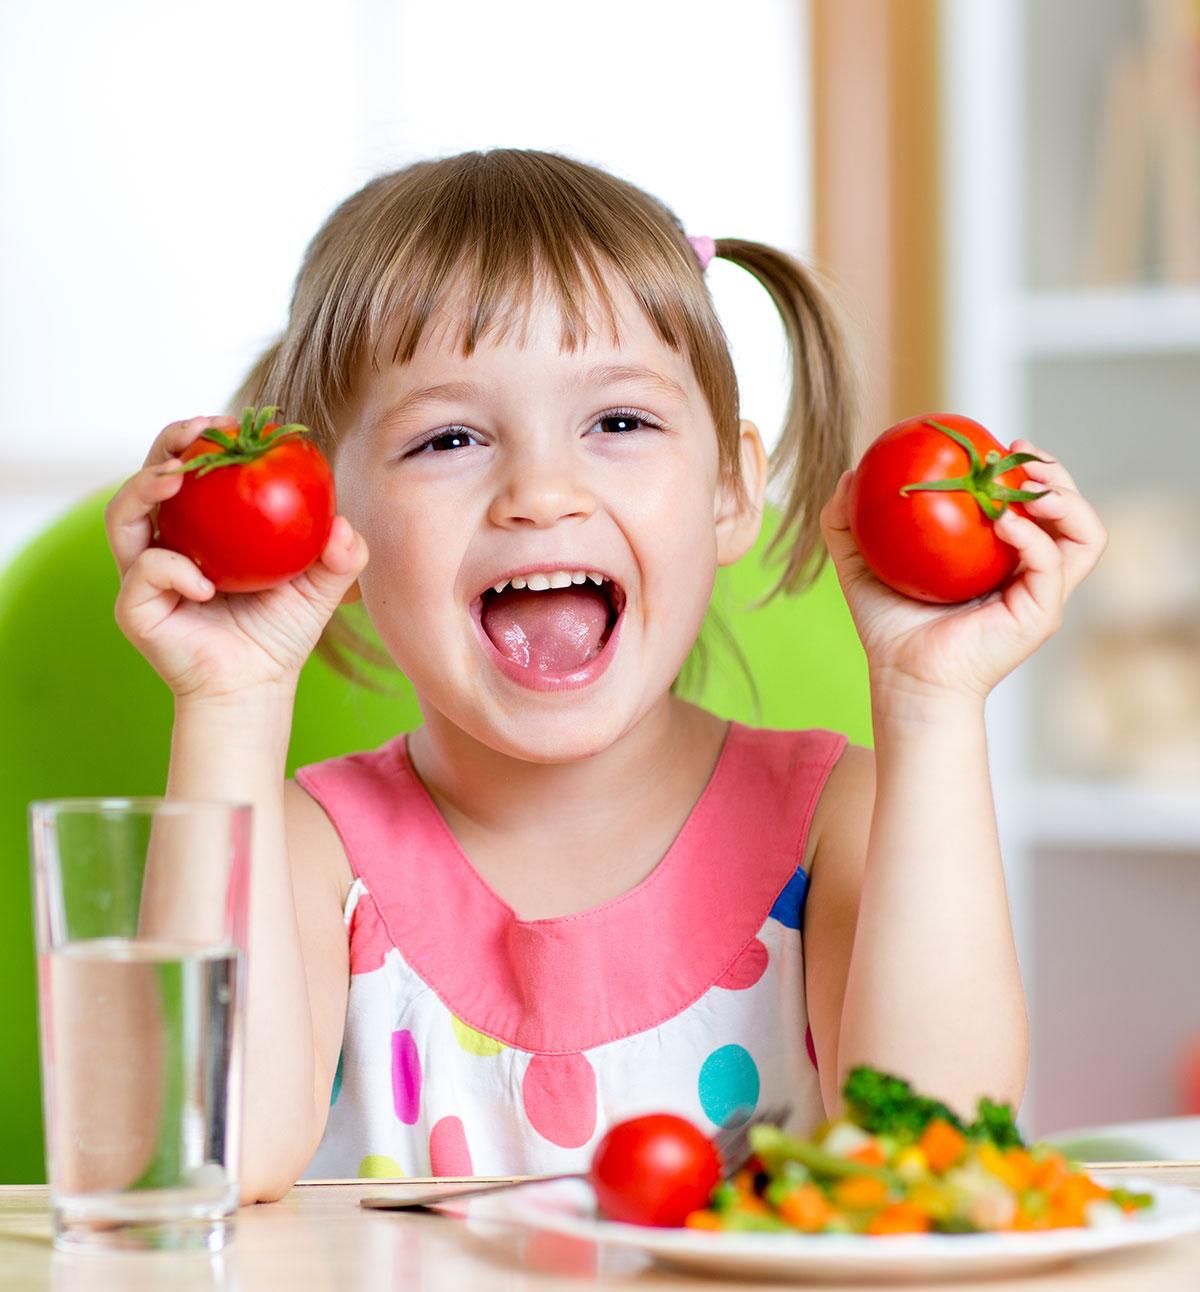 B4School FUN - Alphabet Adventure - F is for Food